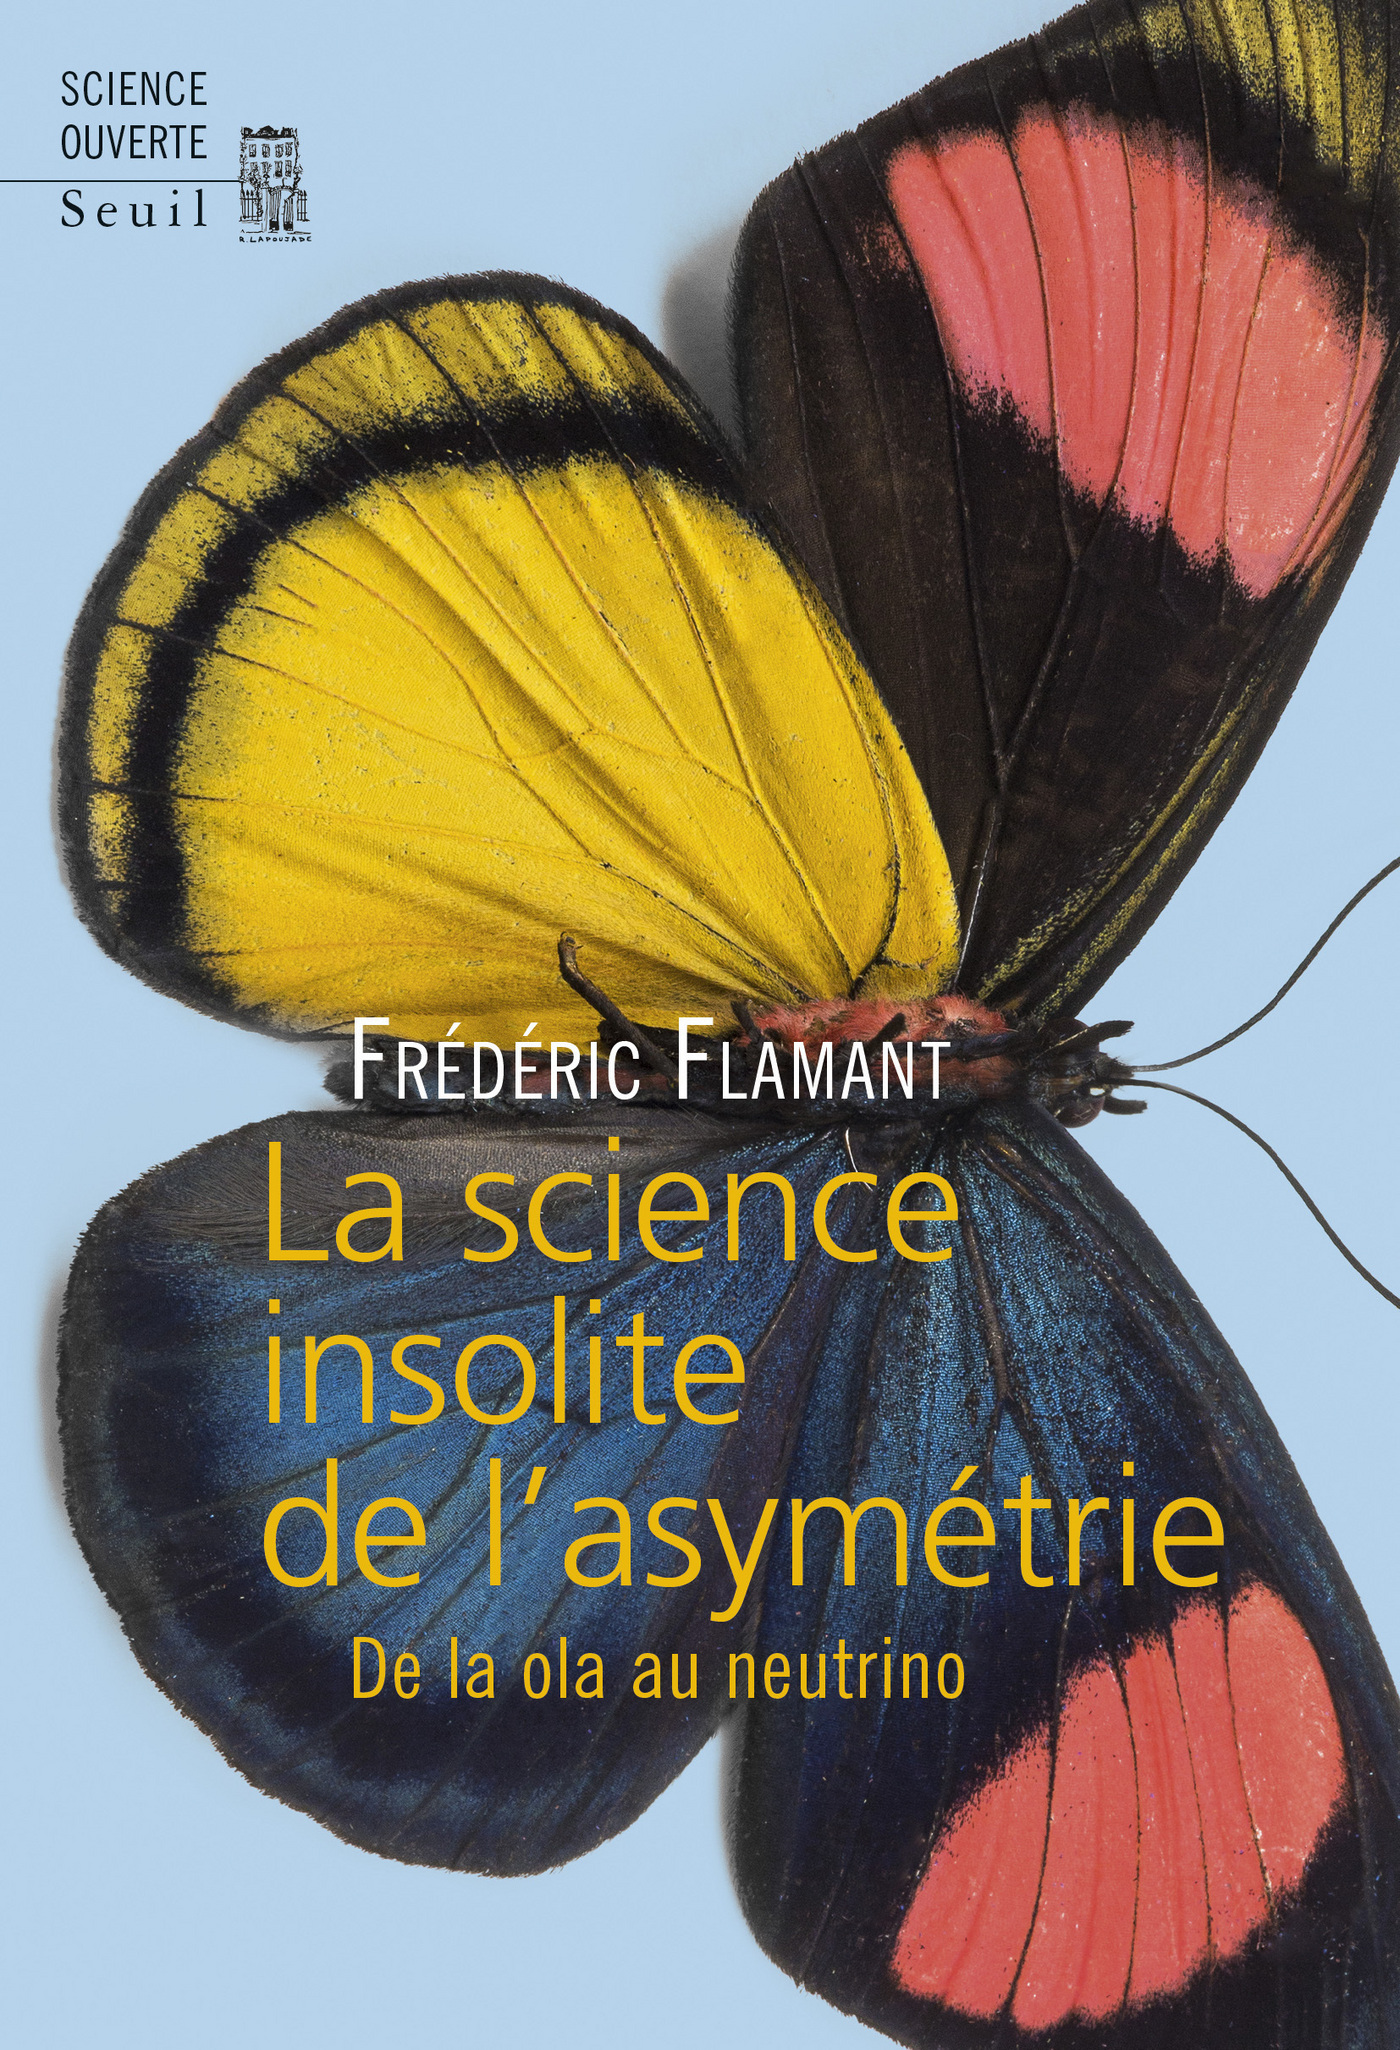 La Science insolite de l'asymétrie. De la ola au neutrino